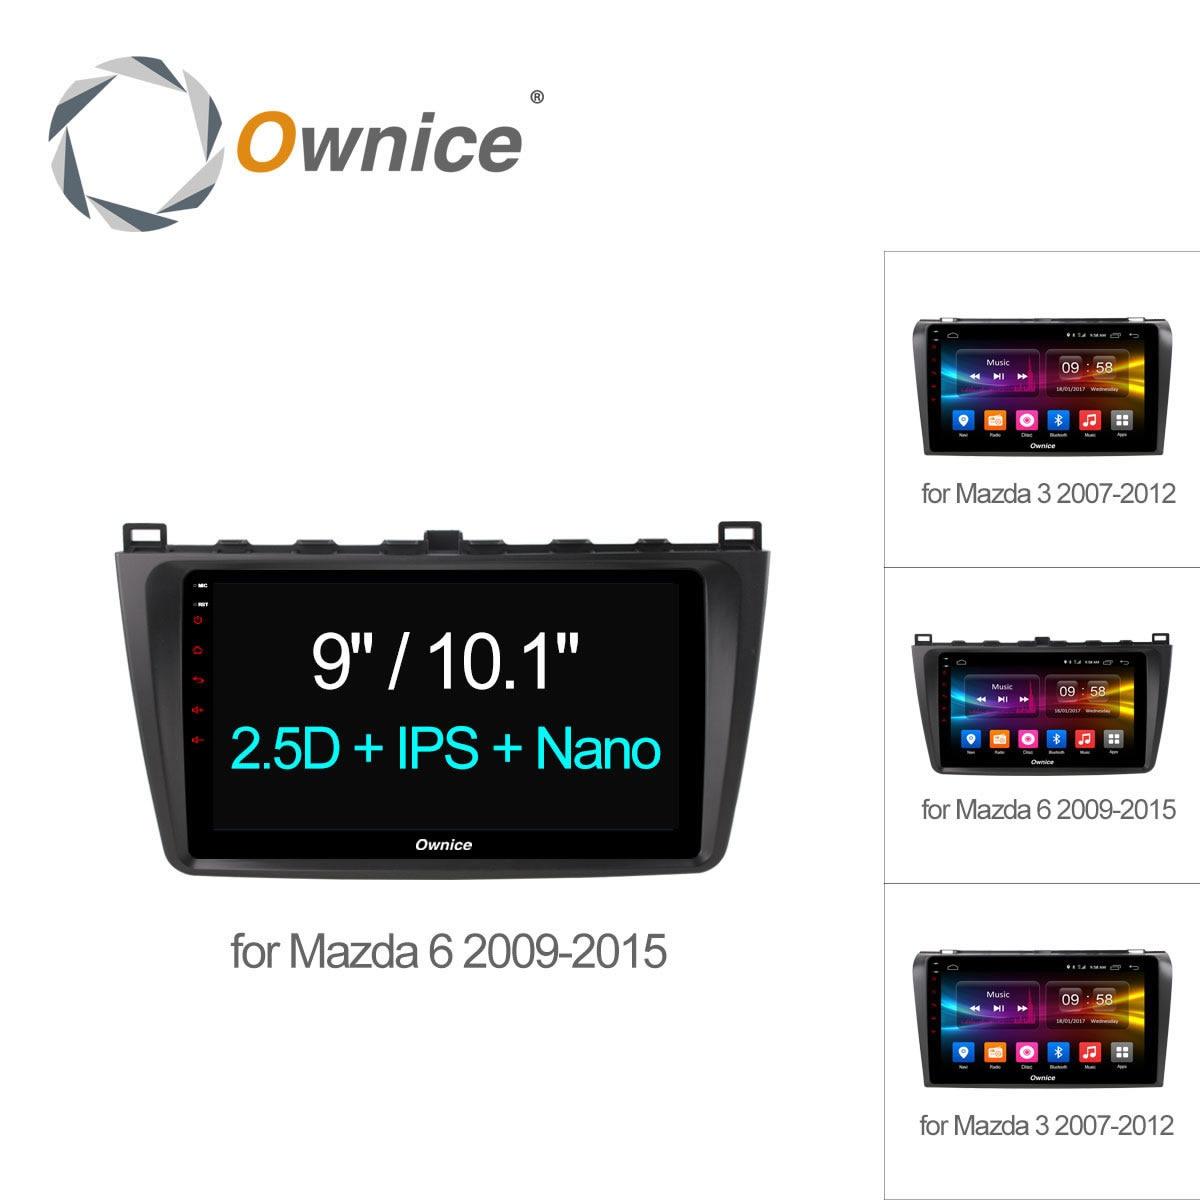 9 Ownice C500+ Android 6.0 Car DVD player GPS For Mazda 3 Mazda 6 Autoradio Multimedia Octa Core 4G LTE 2GB+32GB DAB+ Radio RDS